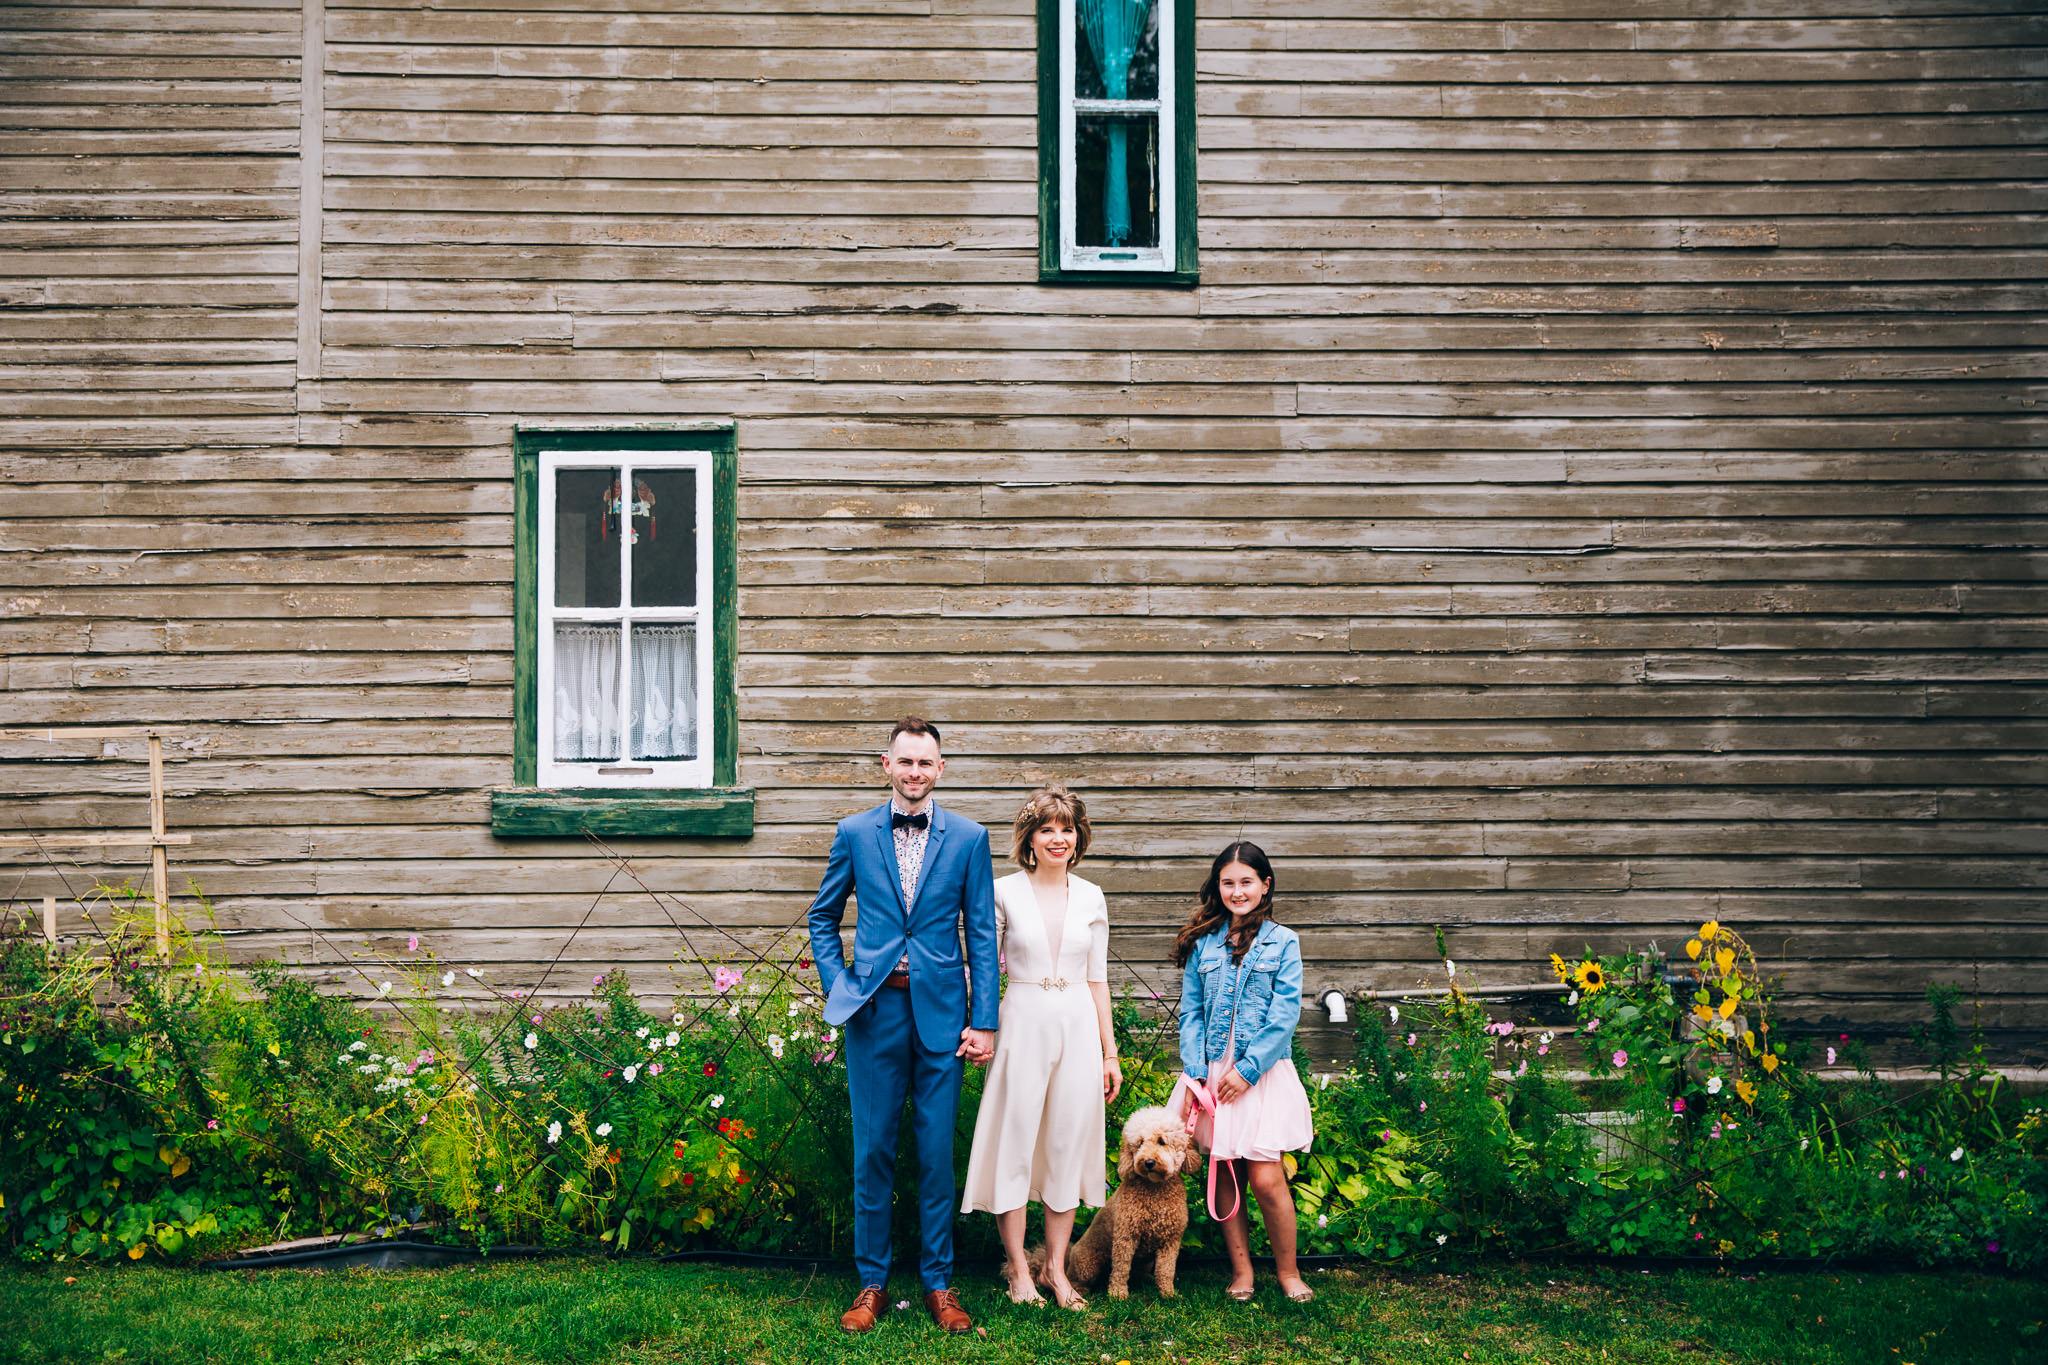 025_Canada-documentary-wedding-photograp